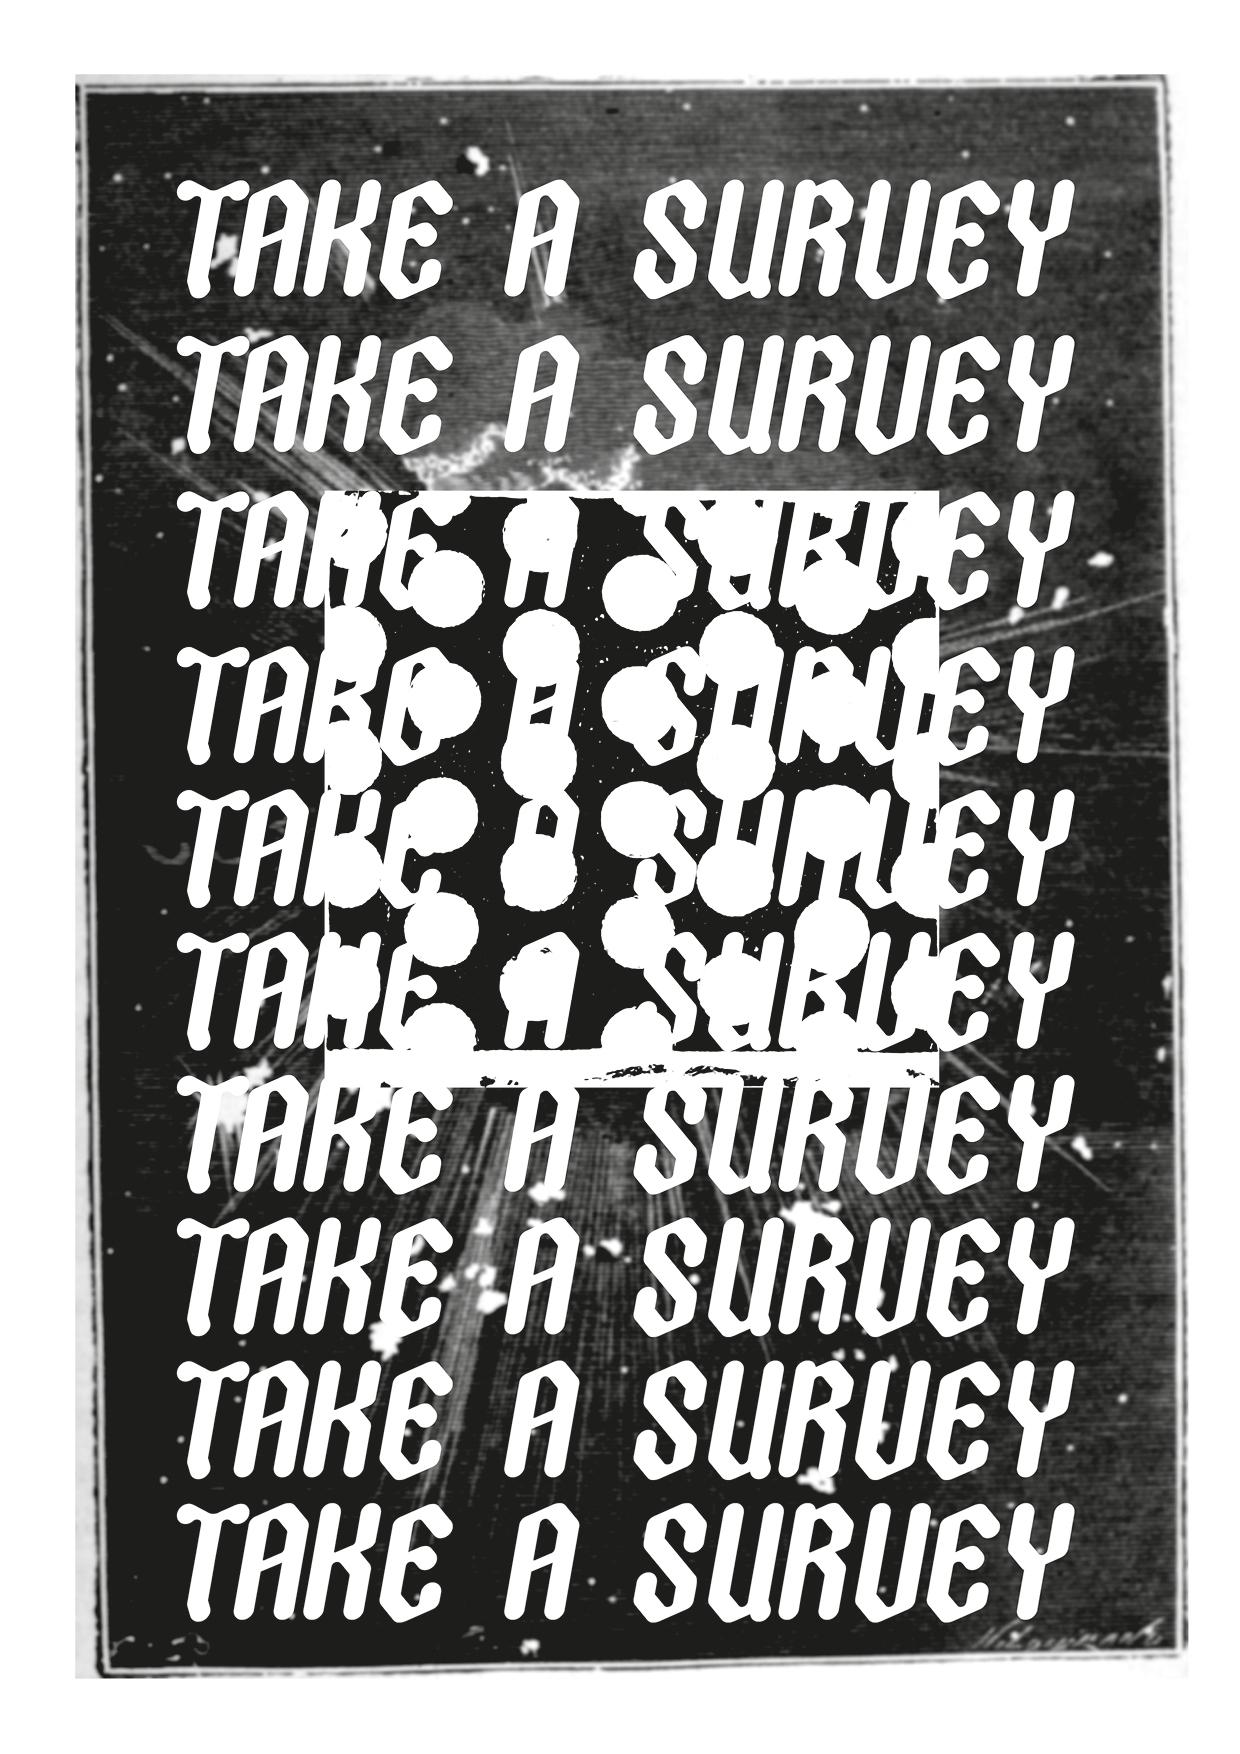 Unsubscribe-print-typography-design-James-Lee-Duffy15.jpg